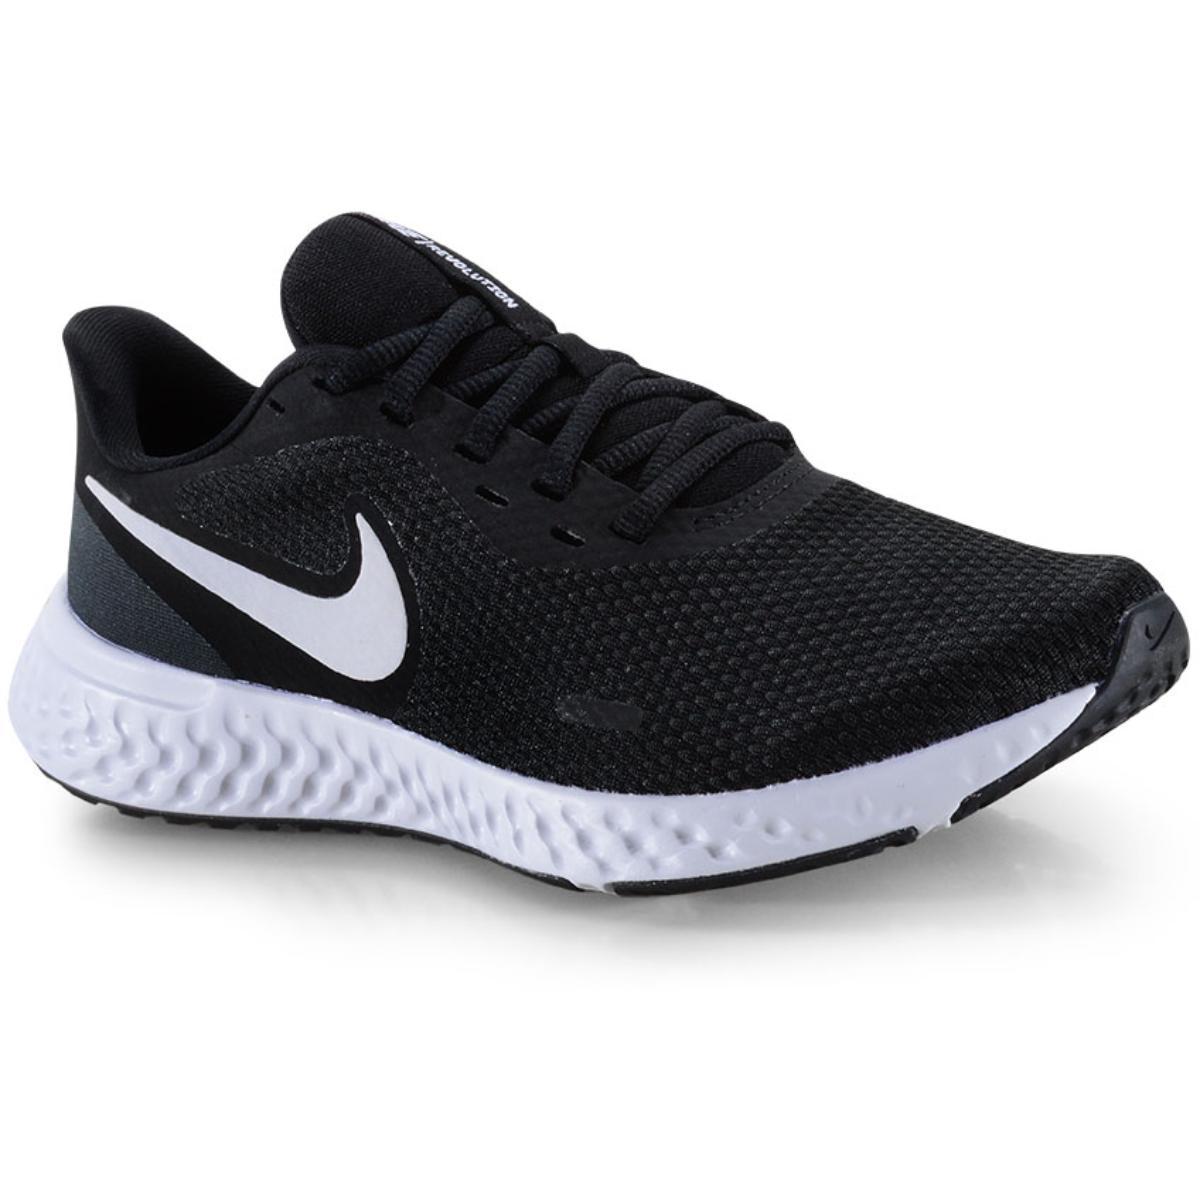 Tênis Feminino Nike Bq3207-002 Revolution 5 Preto/branco